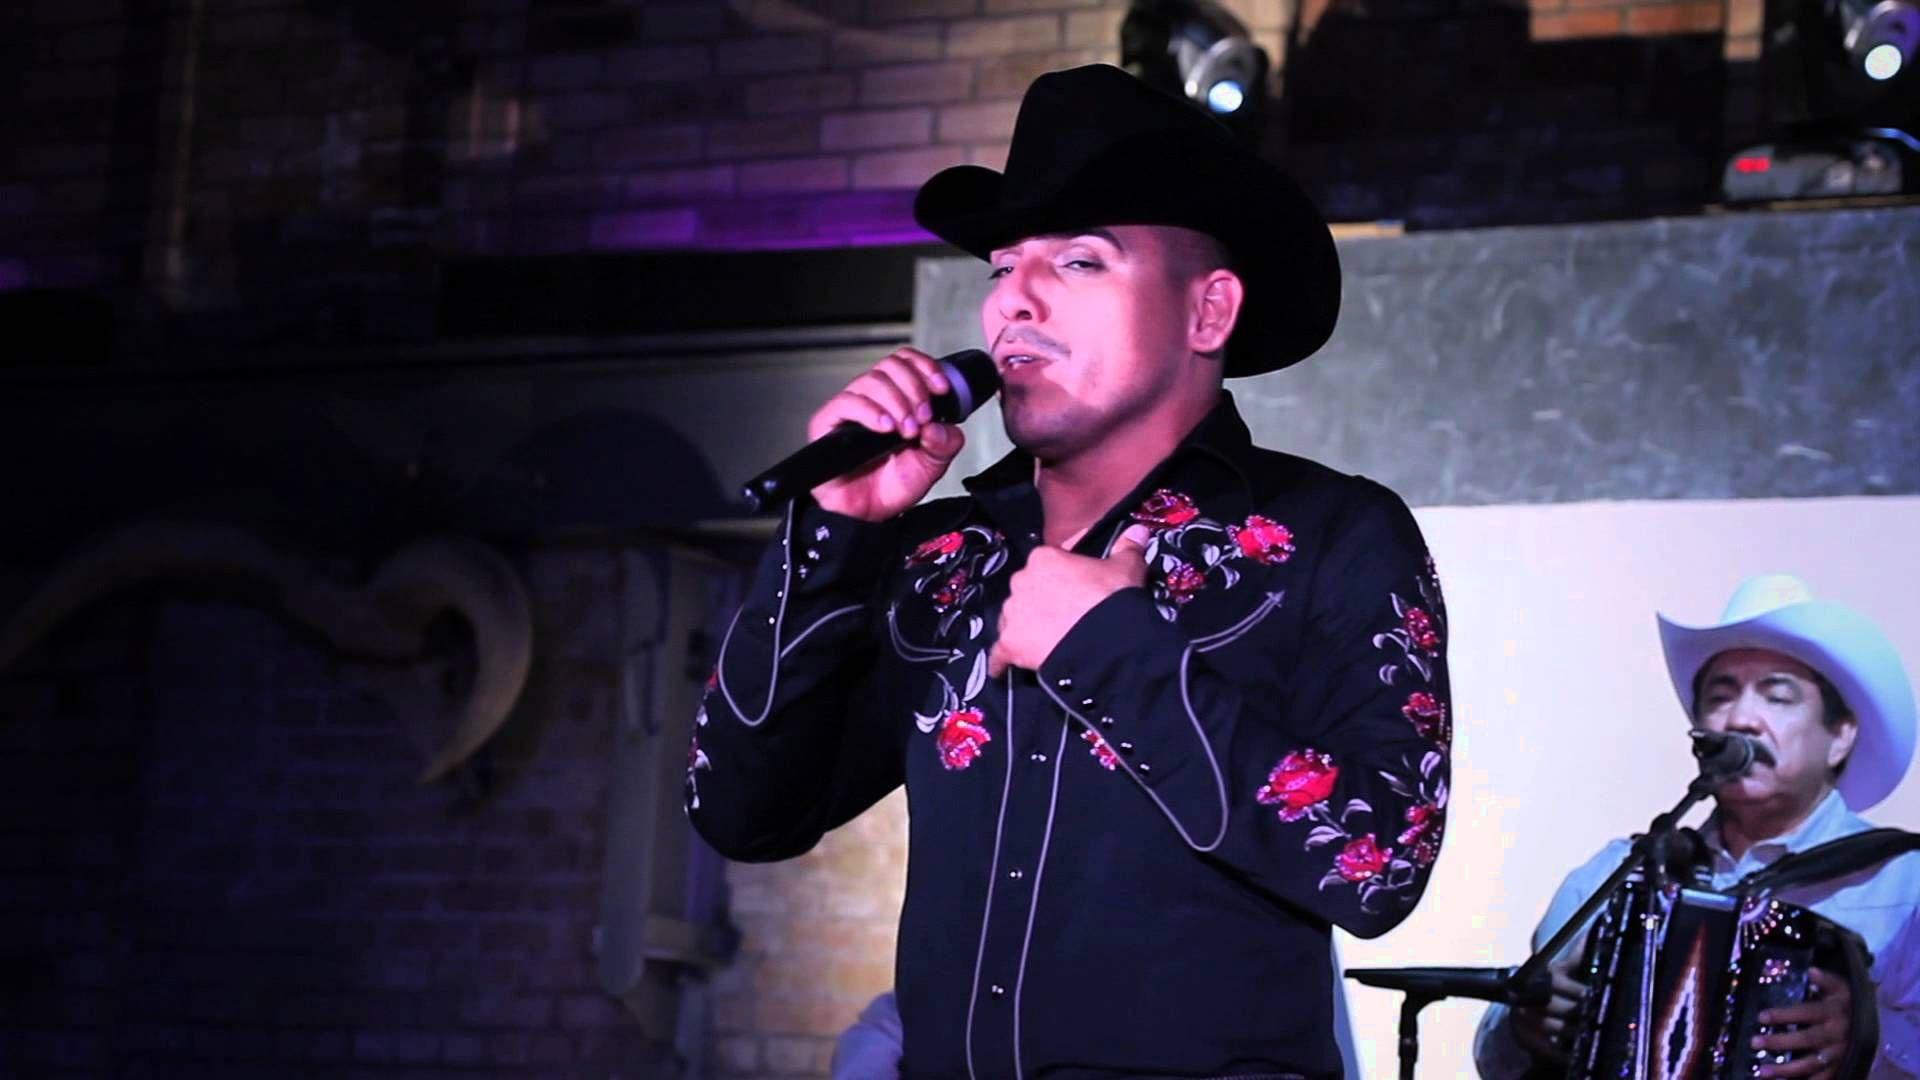 Espinoza Paz Te Dije Live At Mcallen Tx 2011 Musical  # Muebles Batista Chihuahua